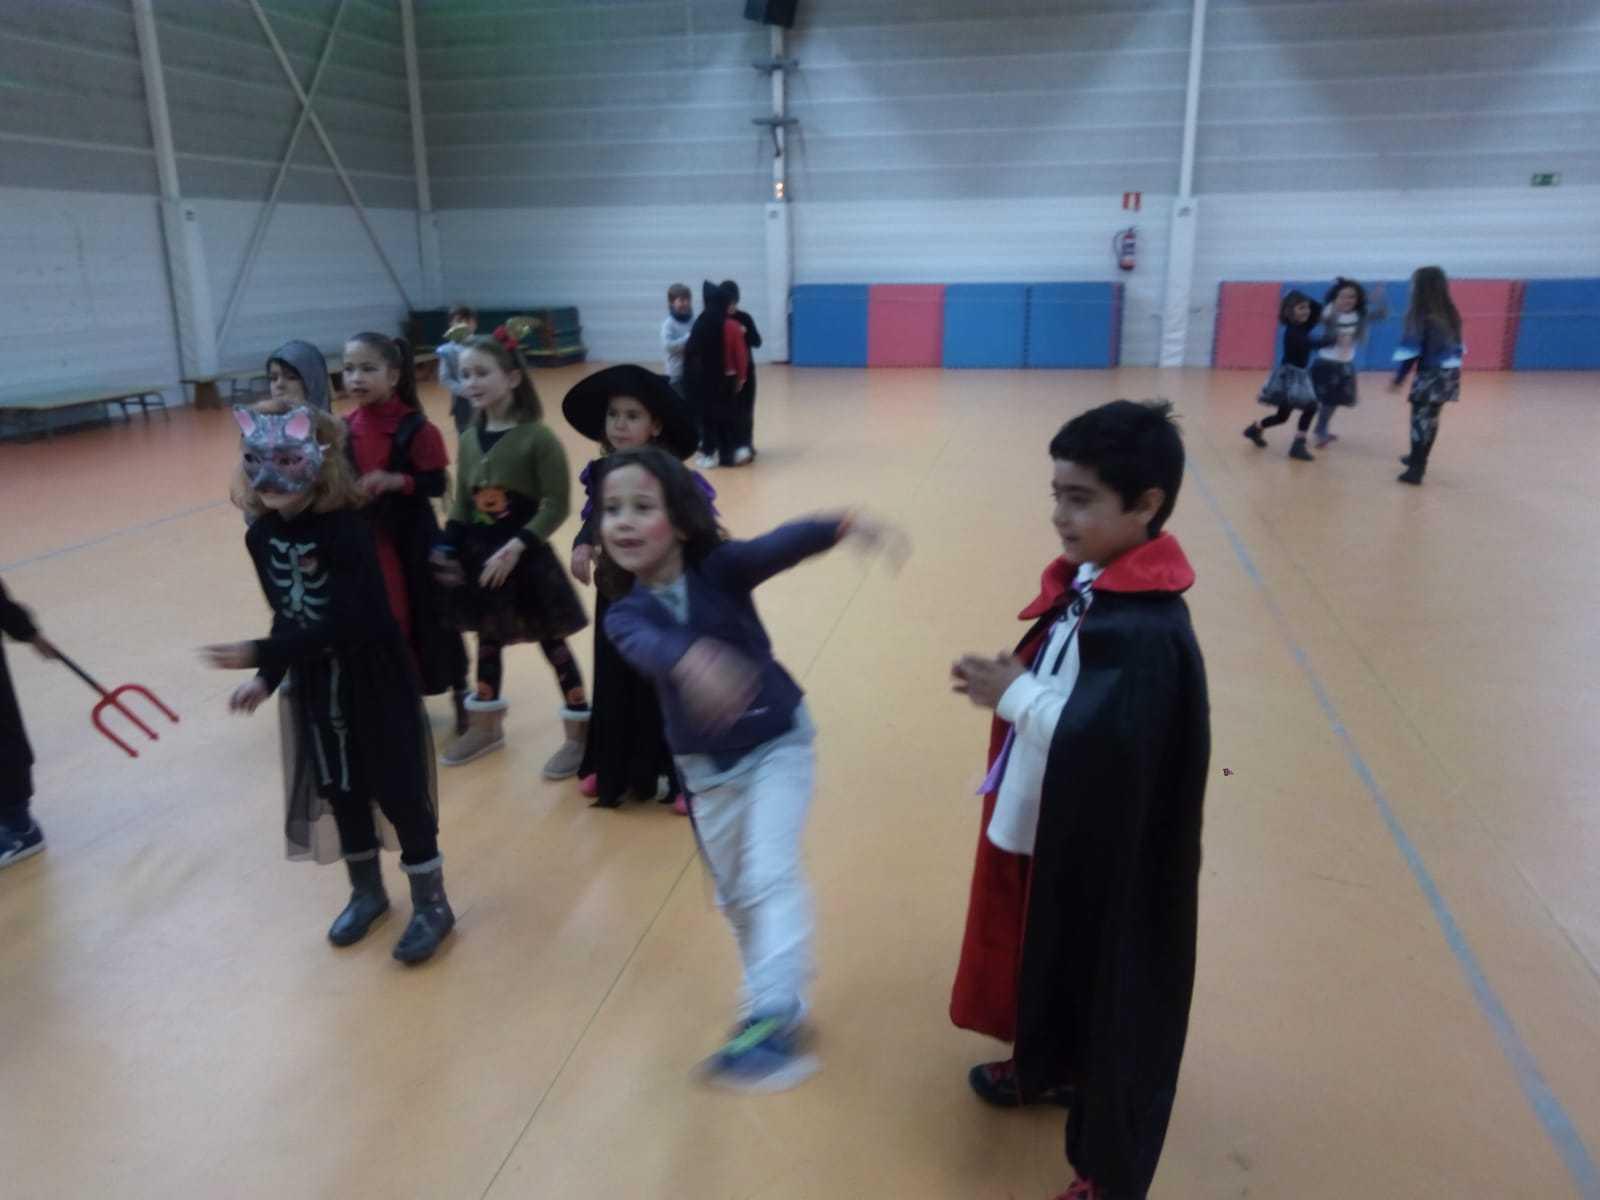 2018_10_31_1º disfruta terrorificamente en Halloween_CEIP FDLR_Las Rozas 2